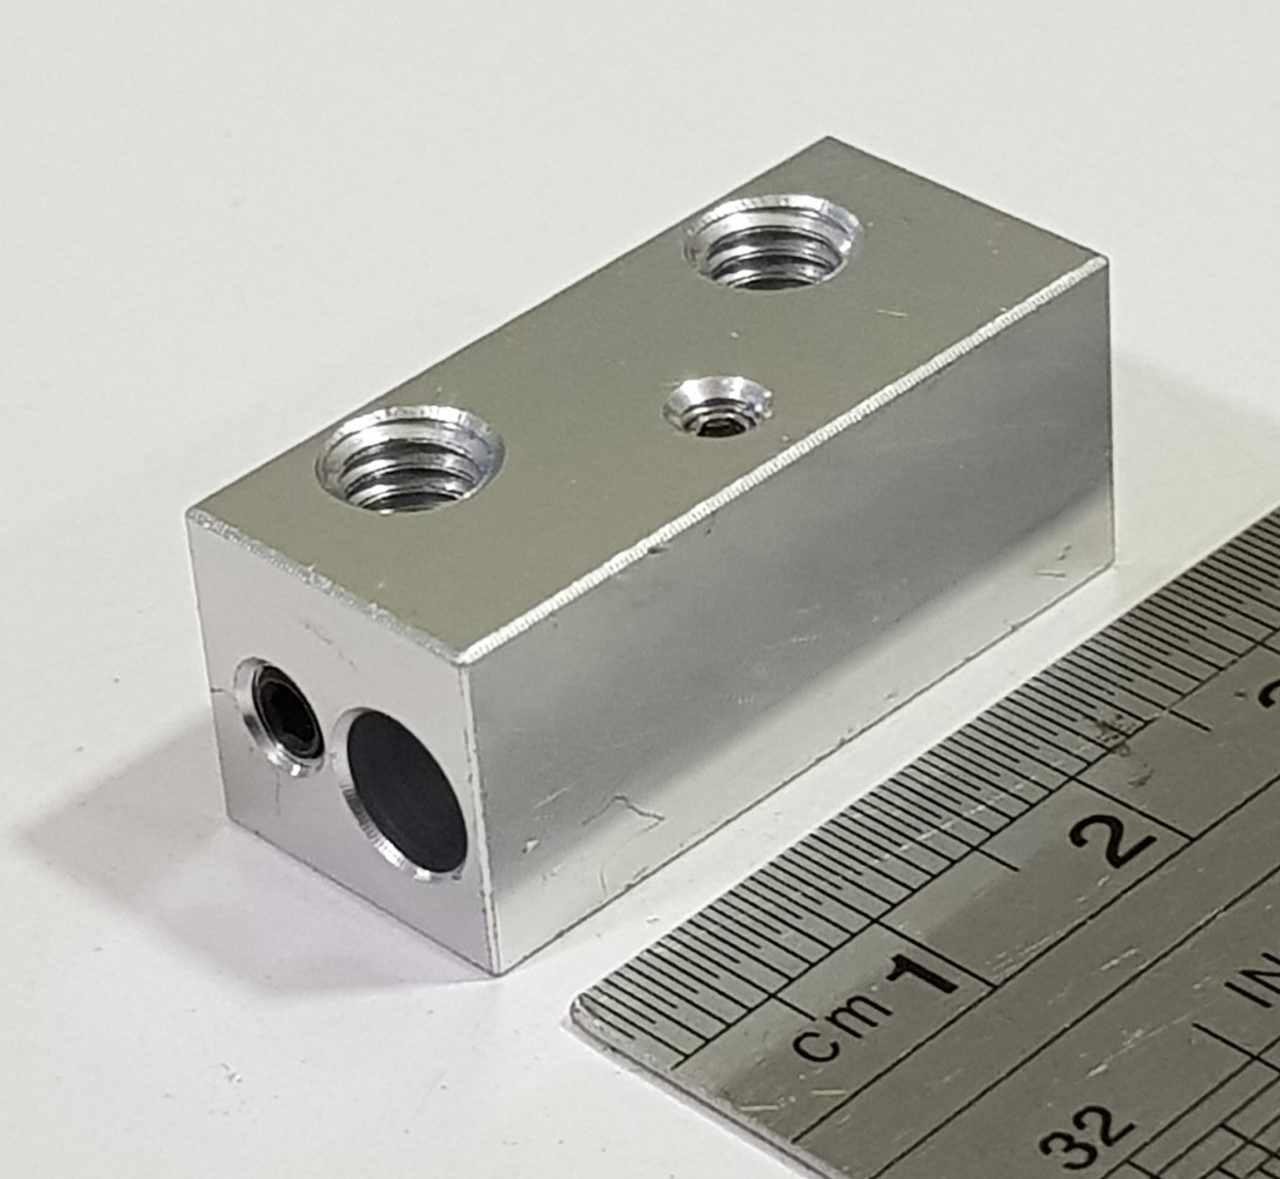 Bloco de aquecimento em Aluminio Cyclop 32x14x13.45mm